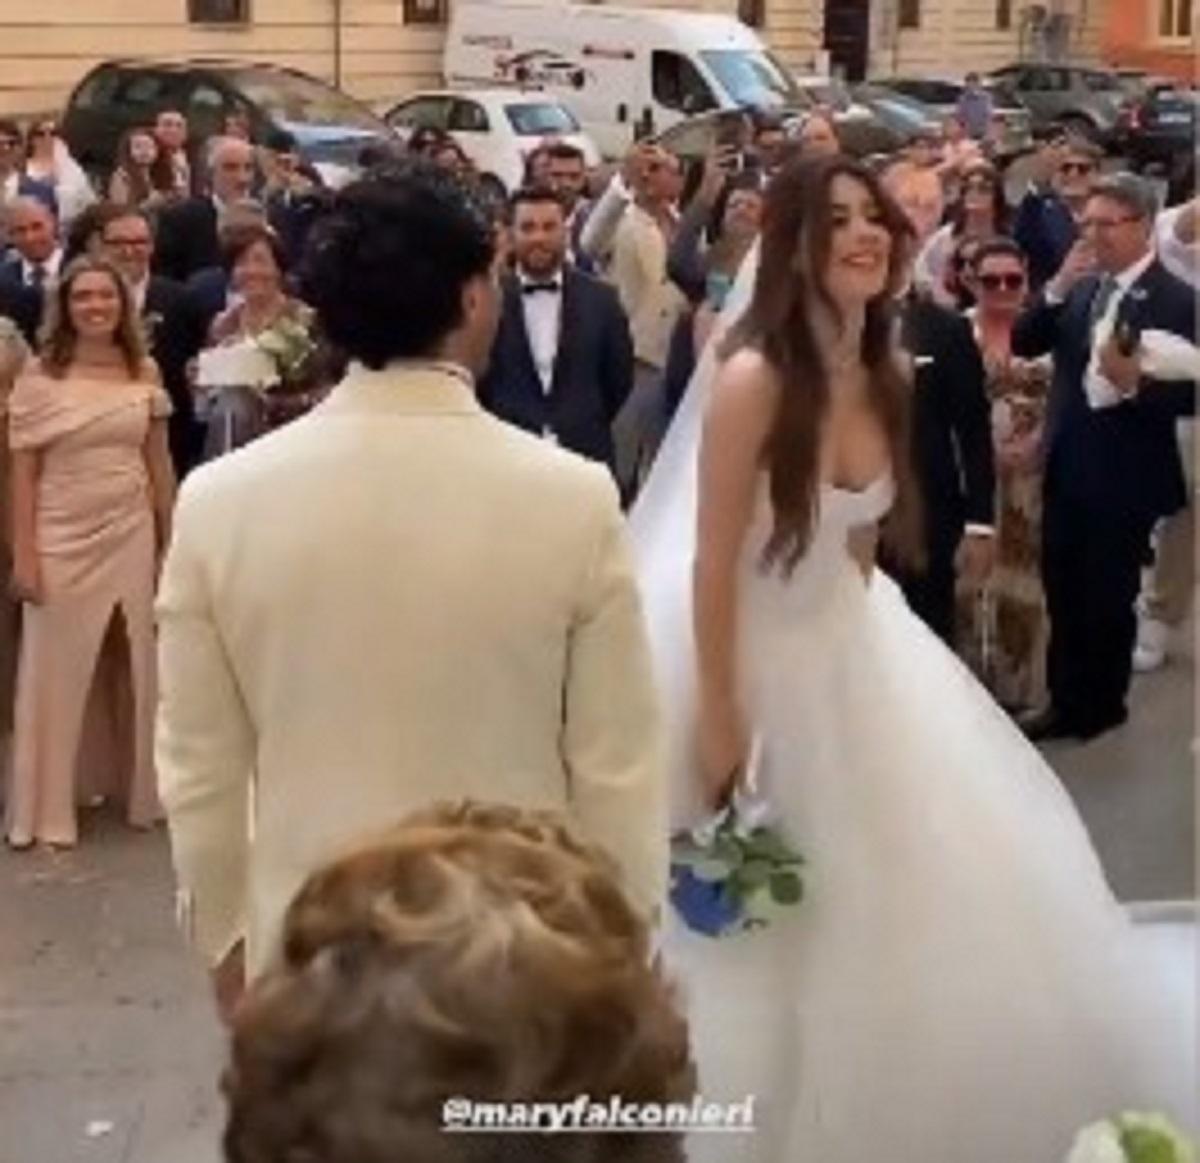 Mary Falconieri Giuseppe Matteo Schiavello nozze